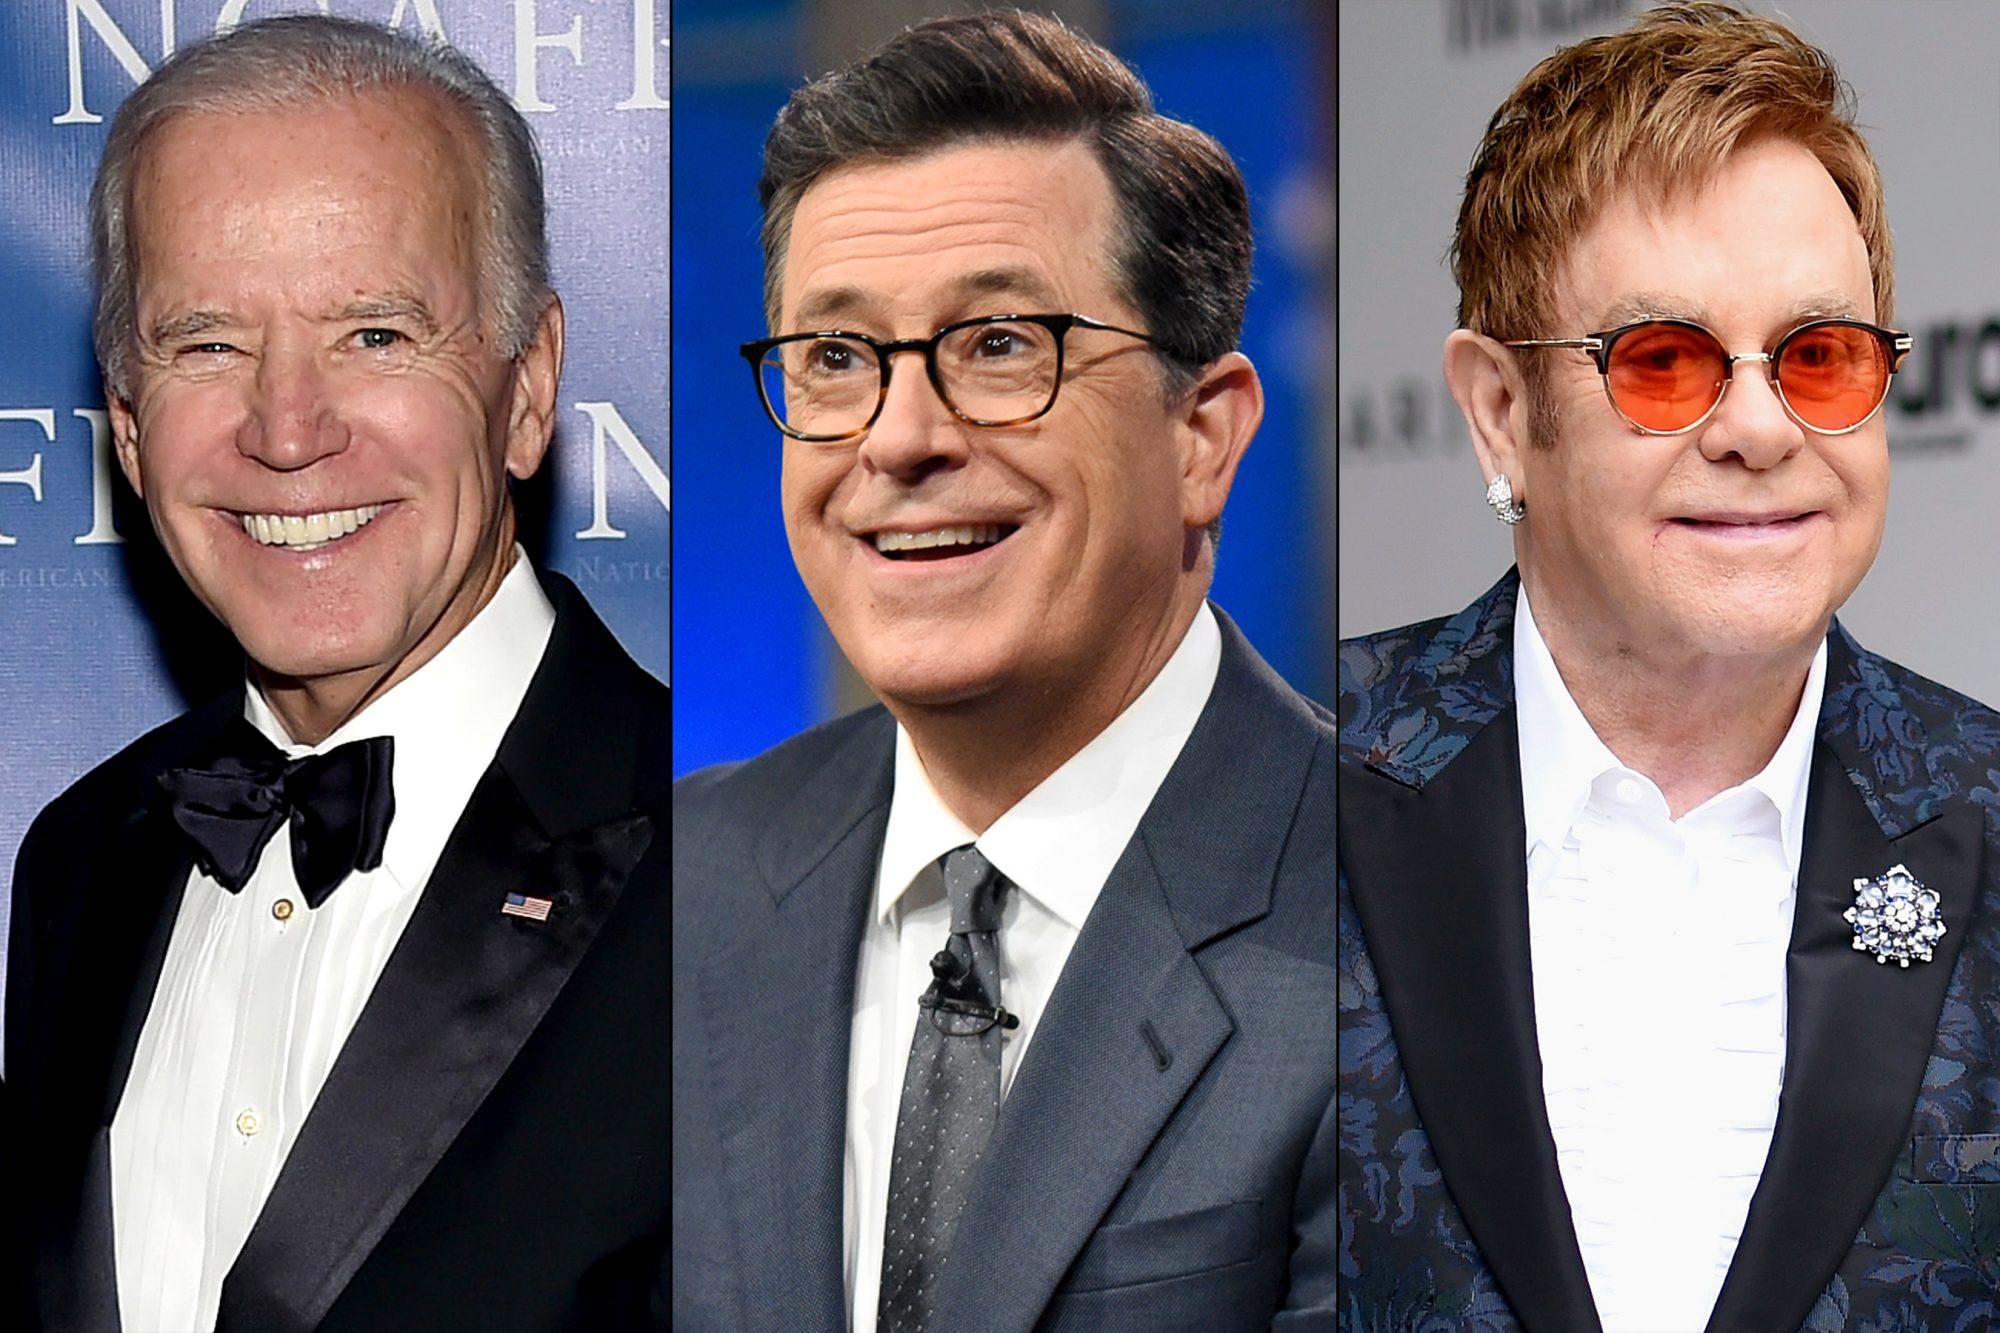 Joe Biden / Stephen Colbert / Elton John